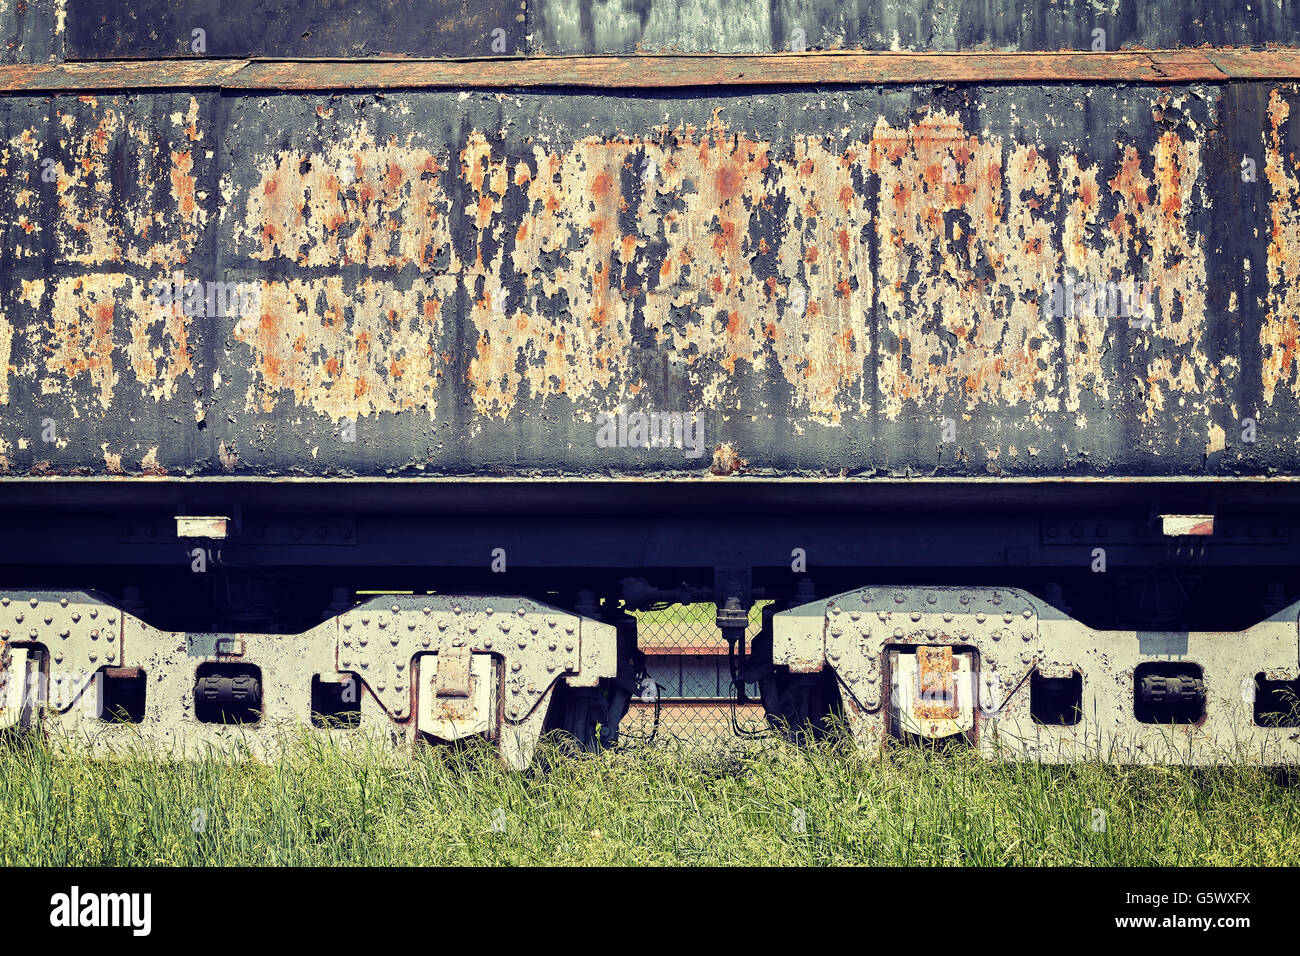 Retro toned old rusty steam locomotive side. - Stock Image